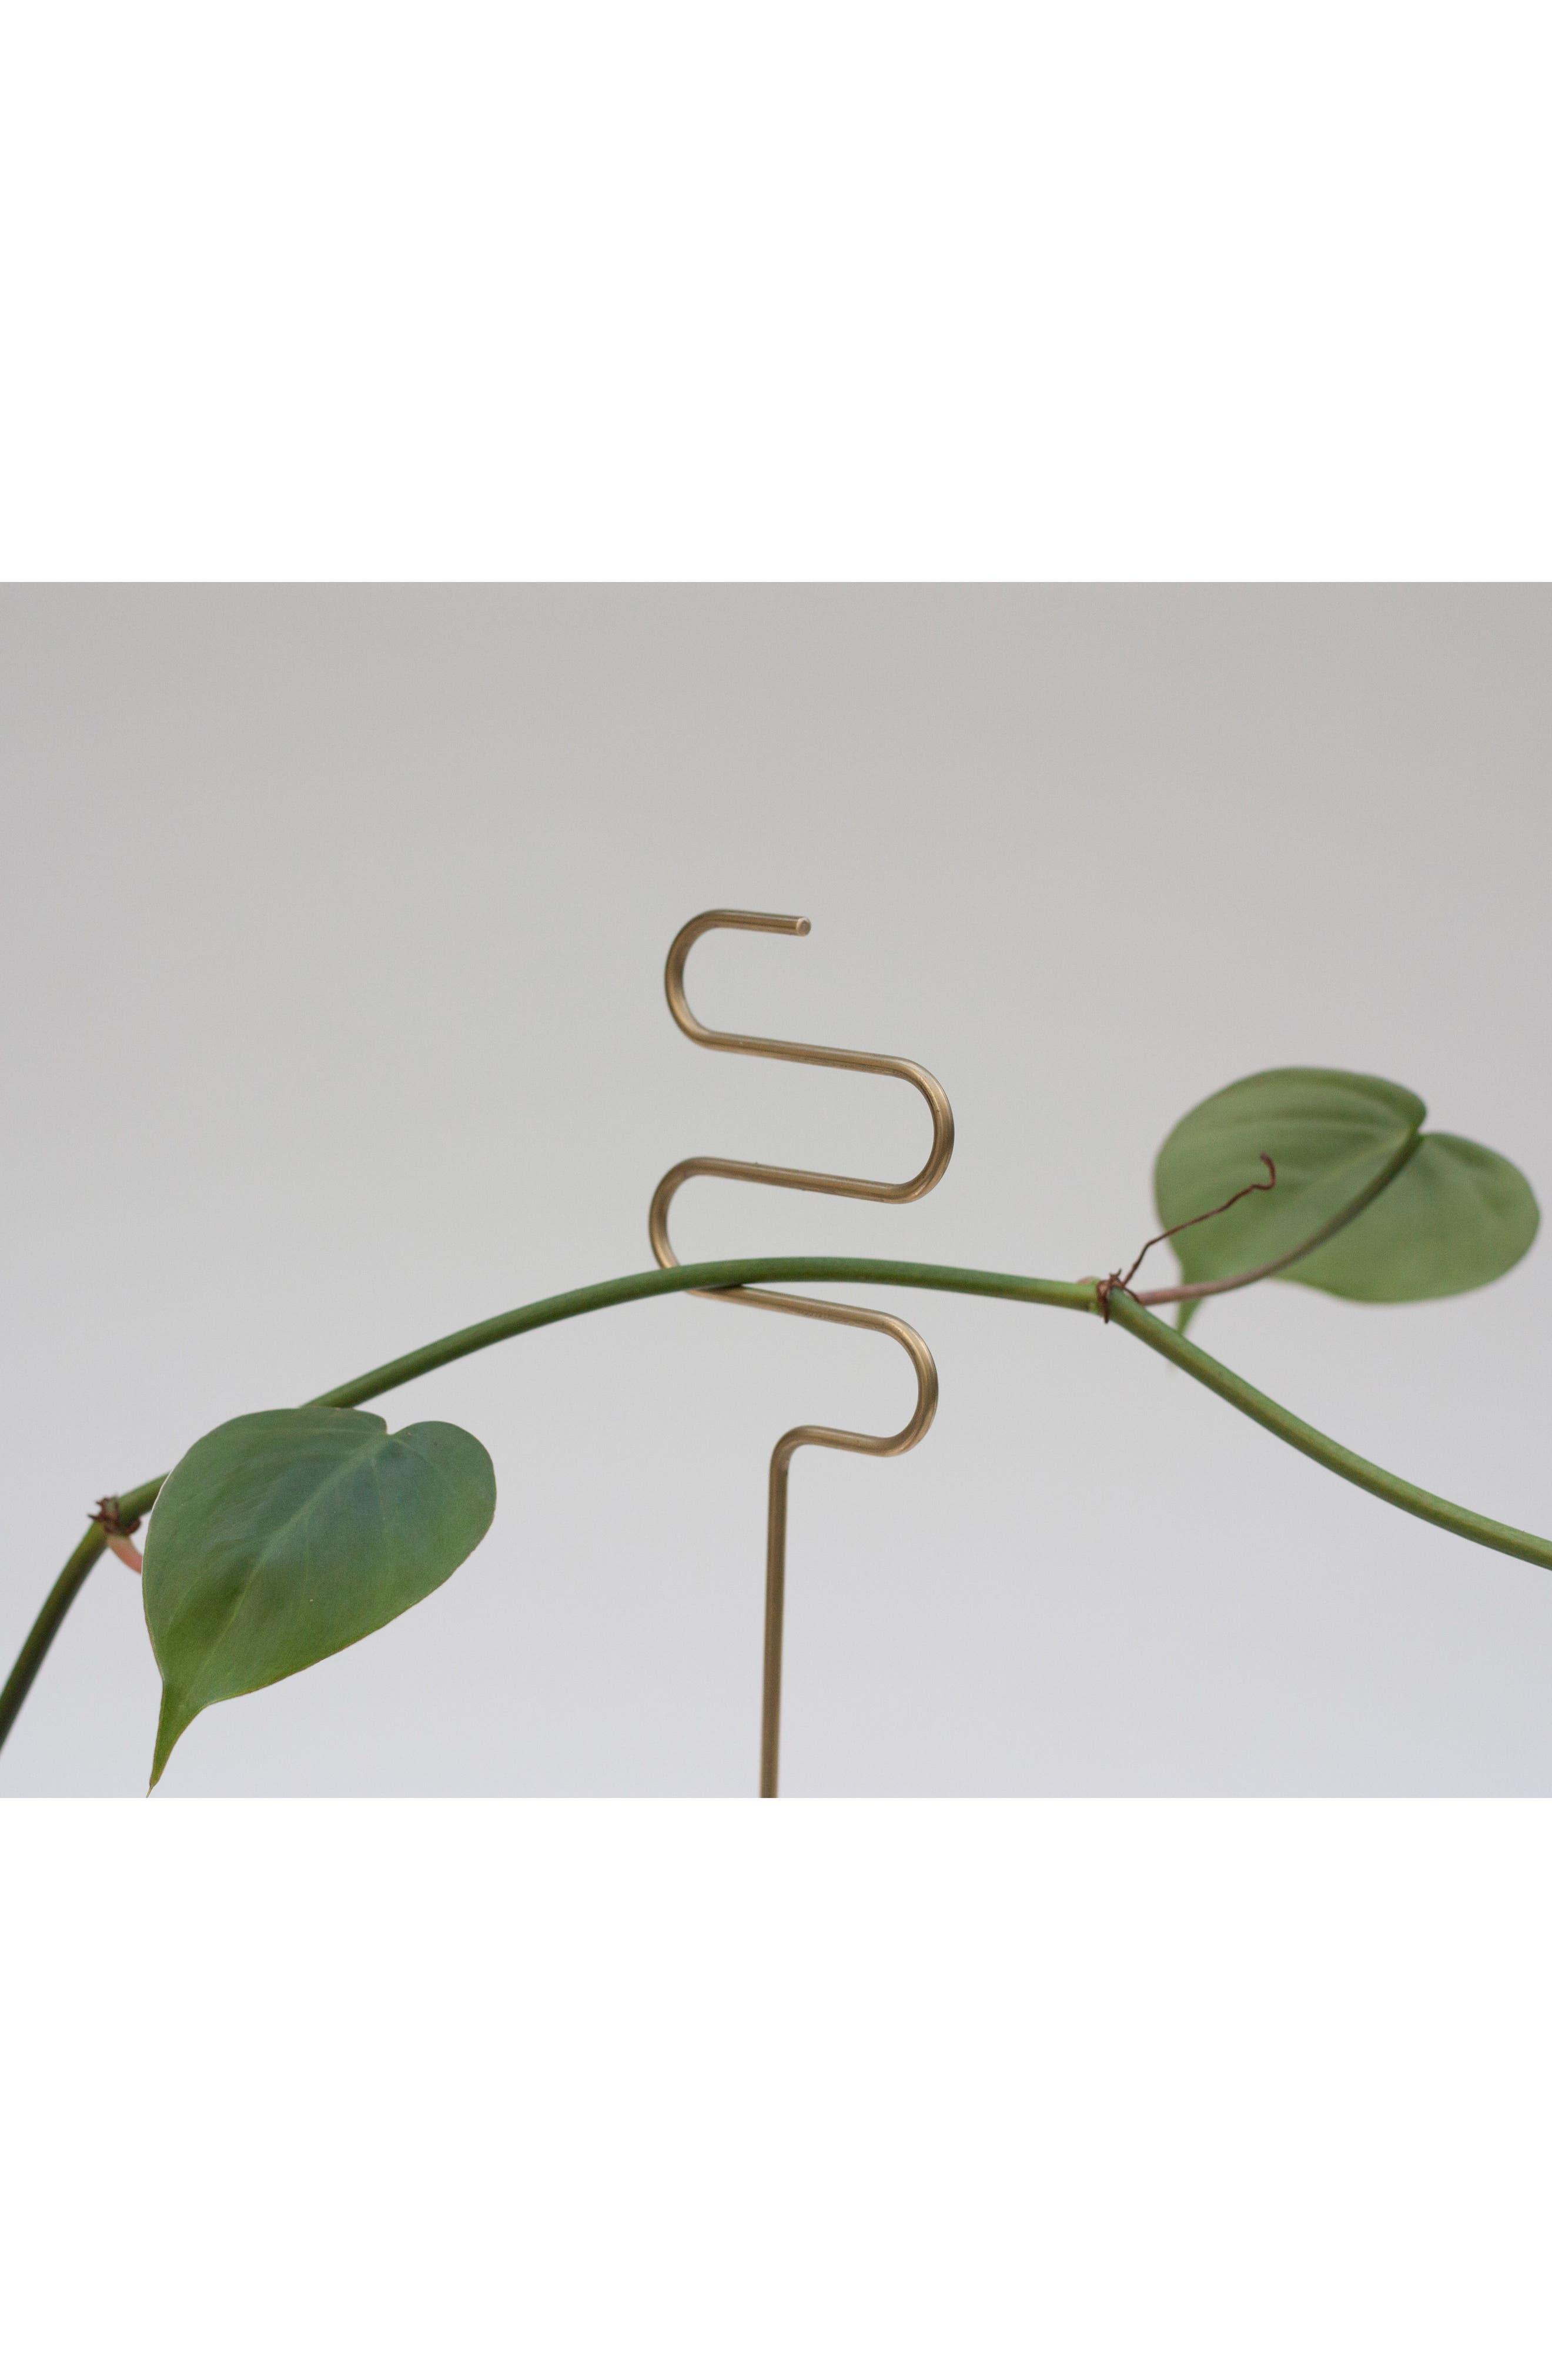 Set of 3 Plant Sticks,                             Alternate thumbnail 5, color,                             BRASS